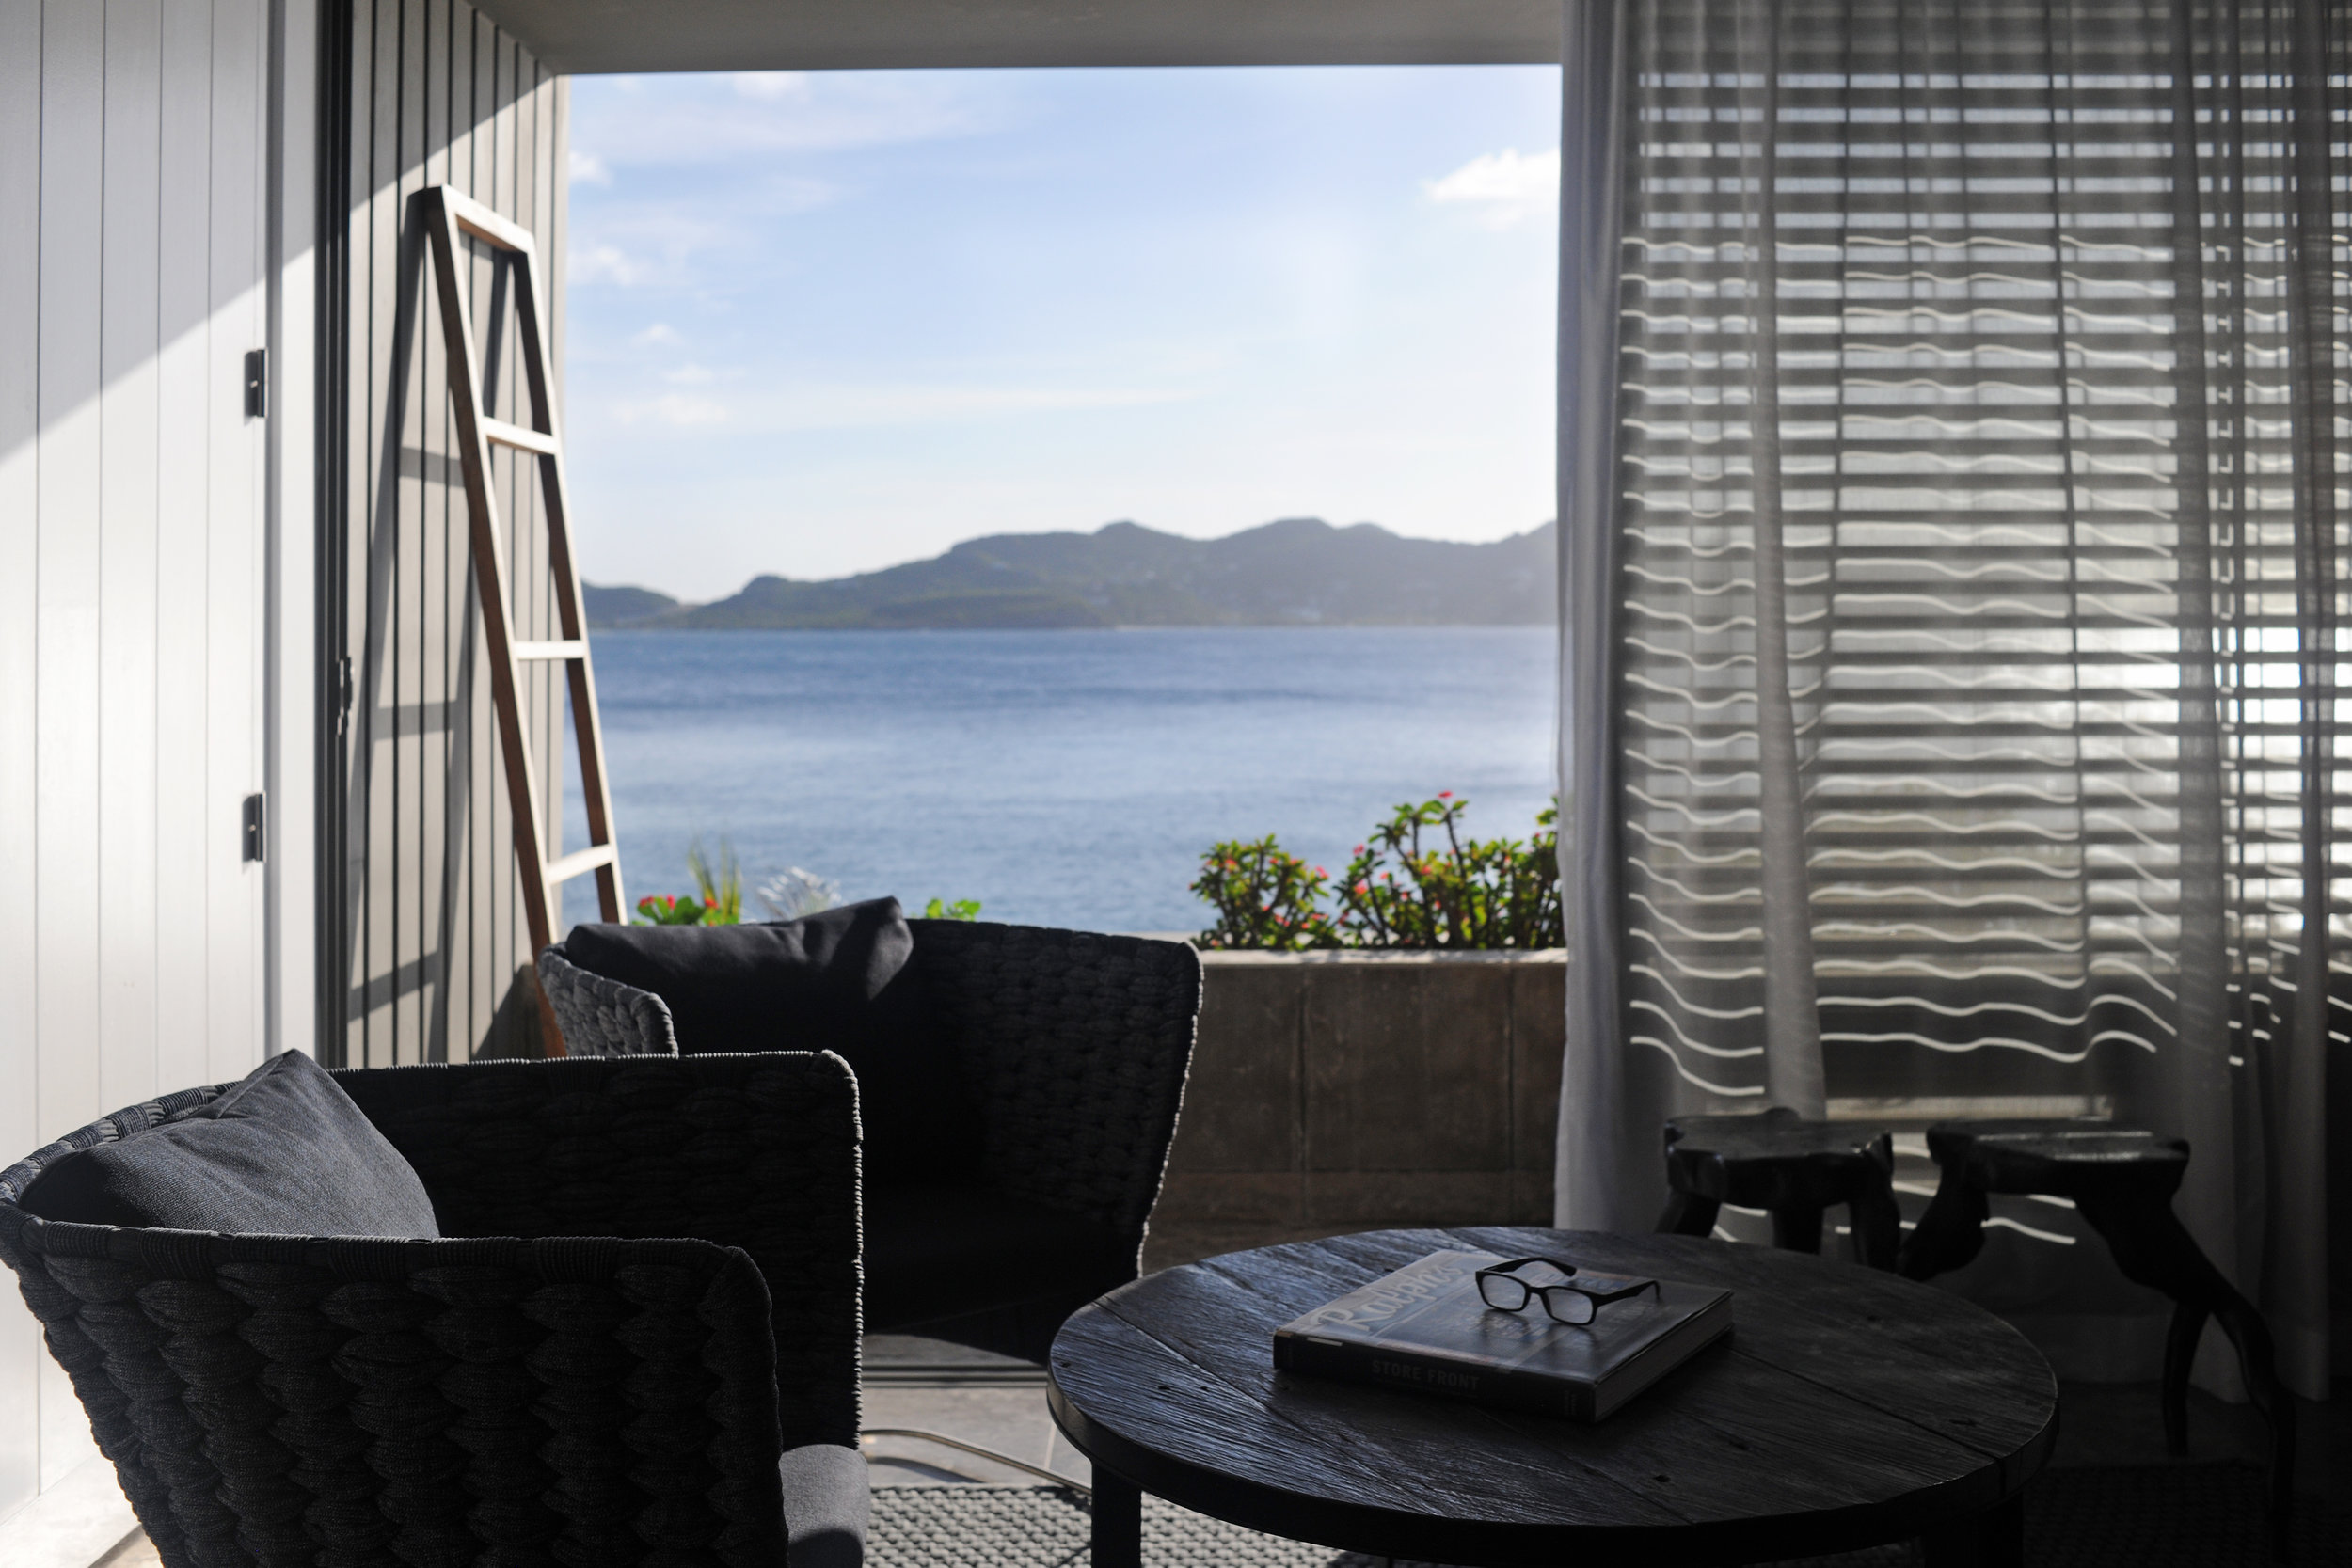 caribbean_StBarths_Hotel_Christopher_Junior_Suite.jpg